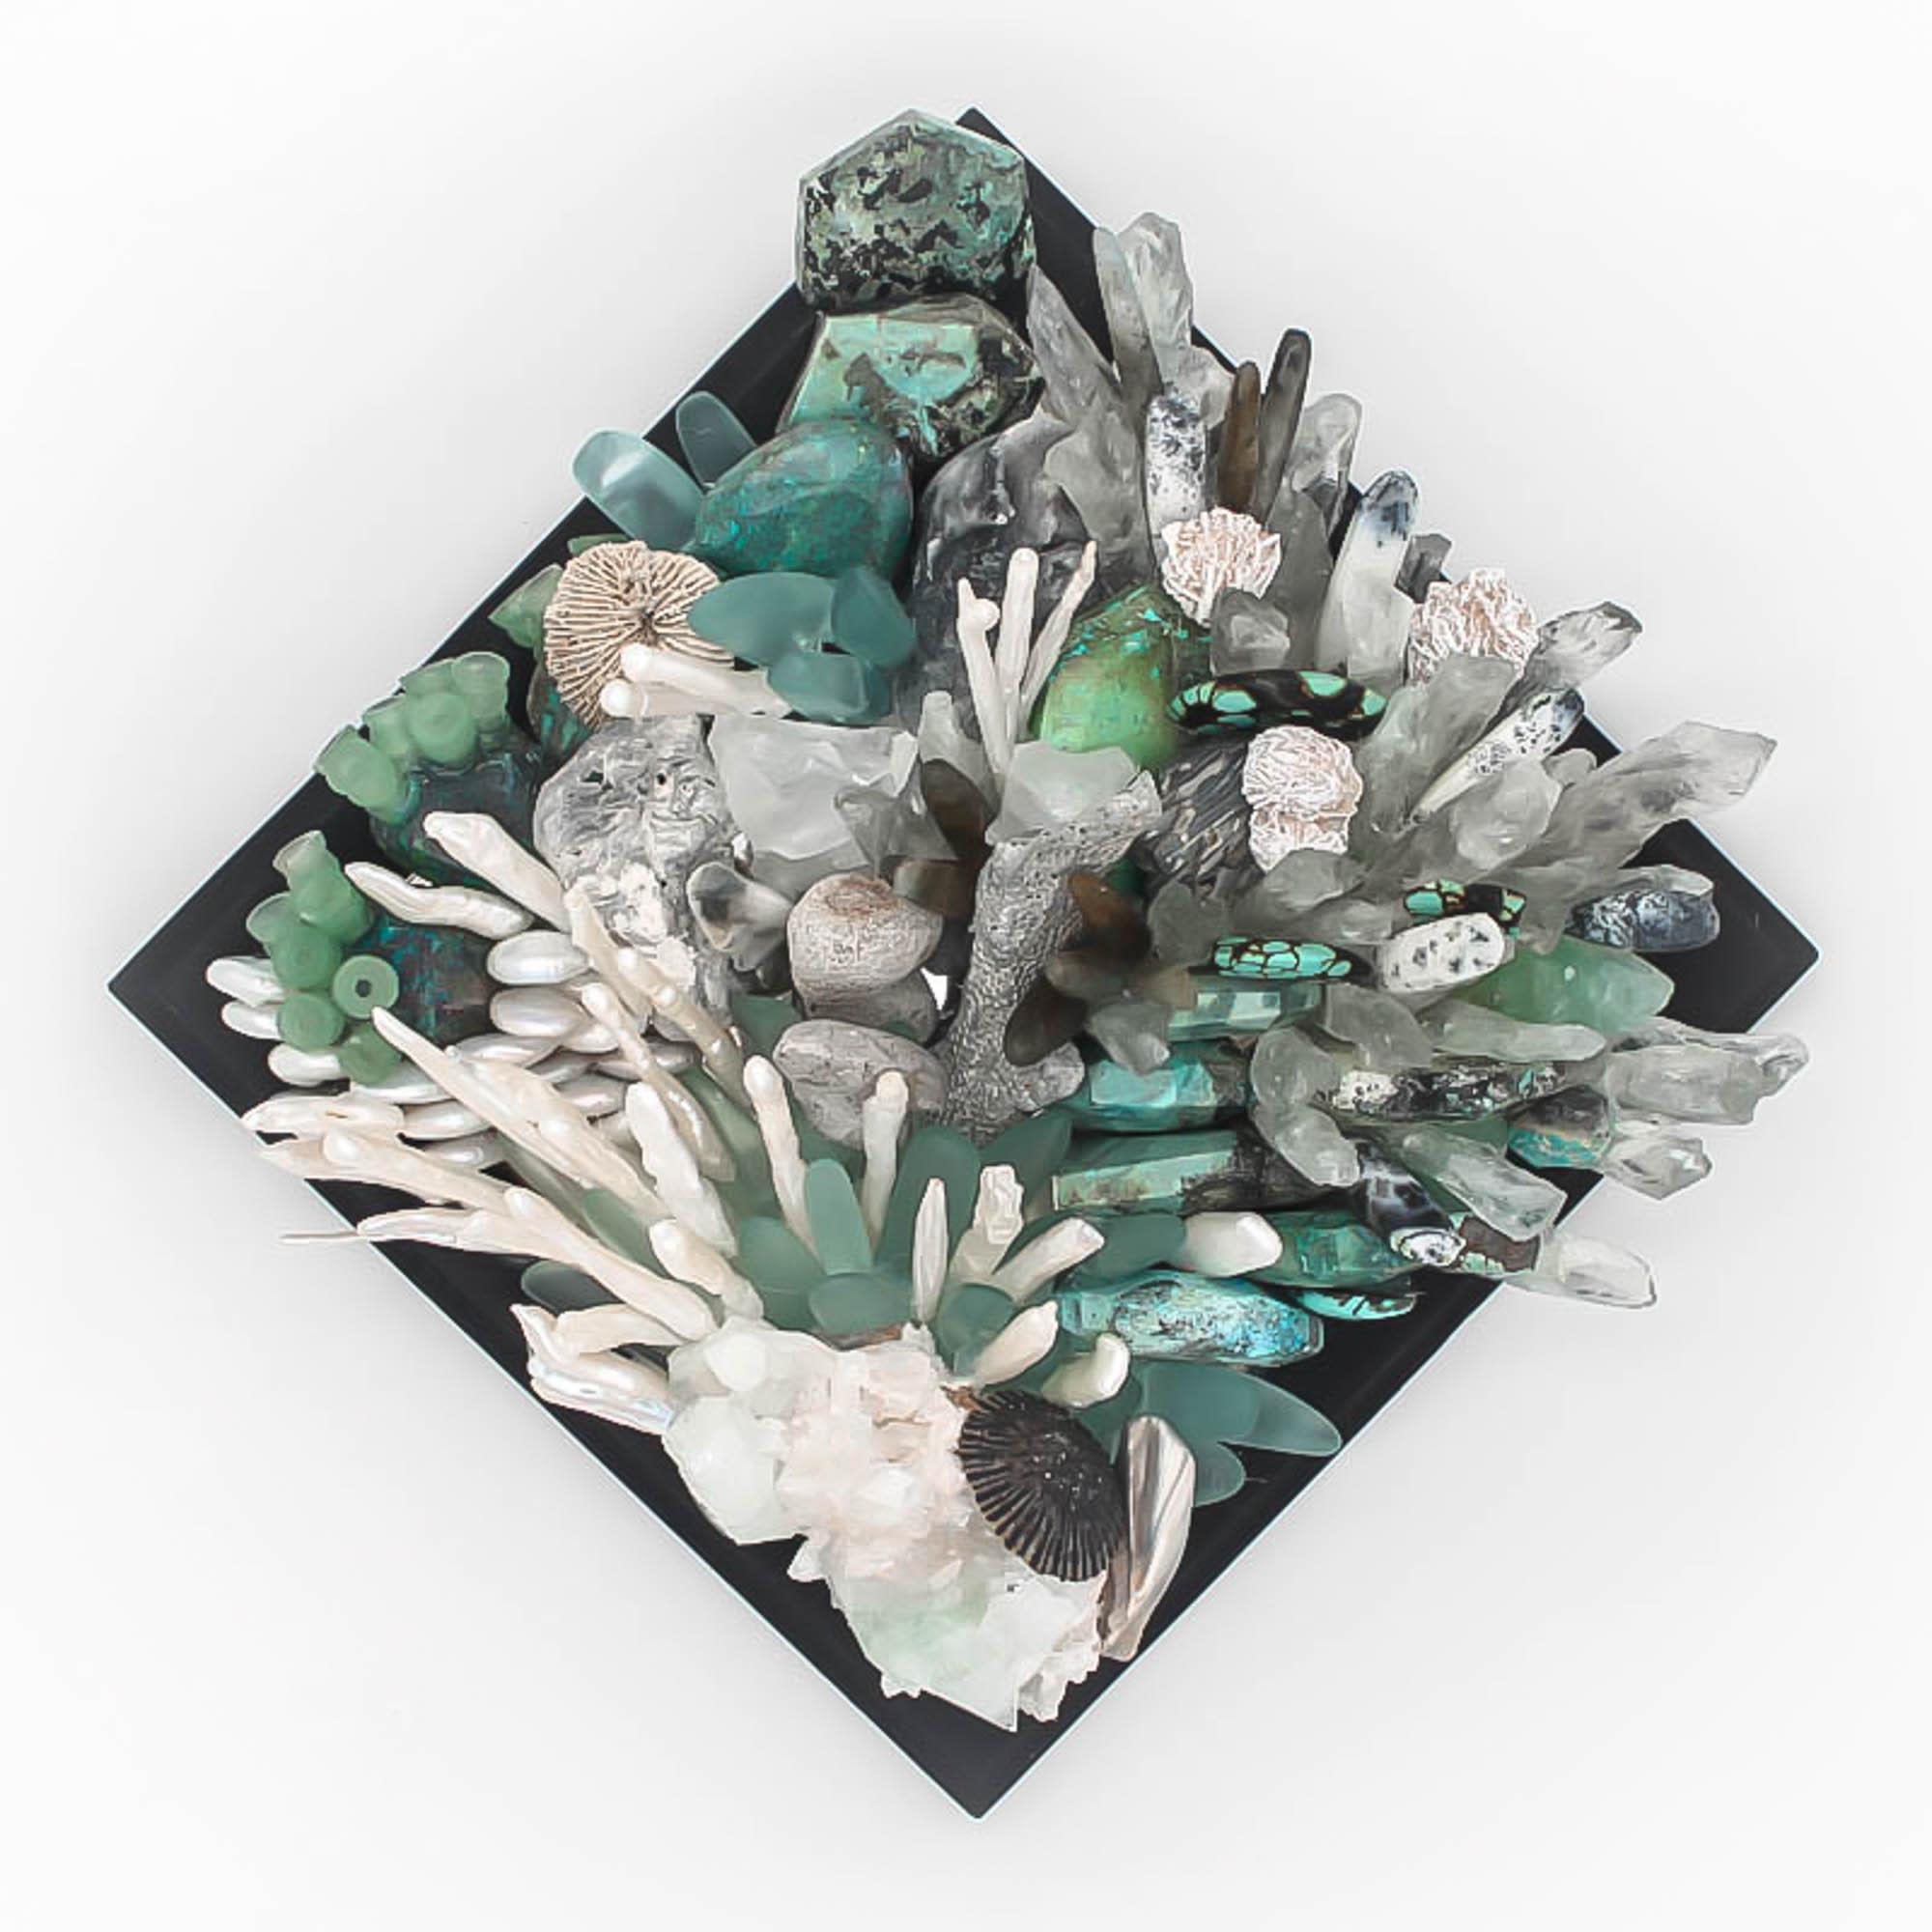 Reef wall 3 wgtse0